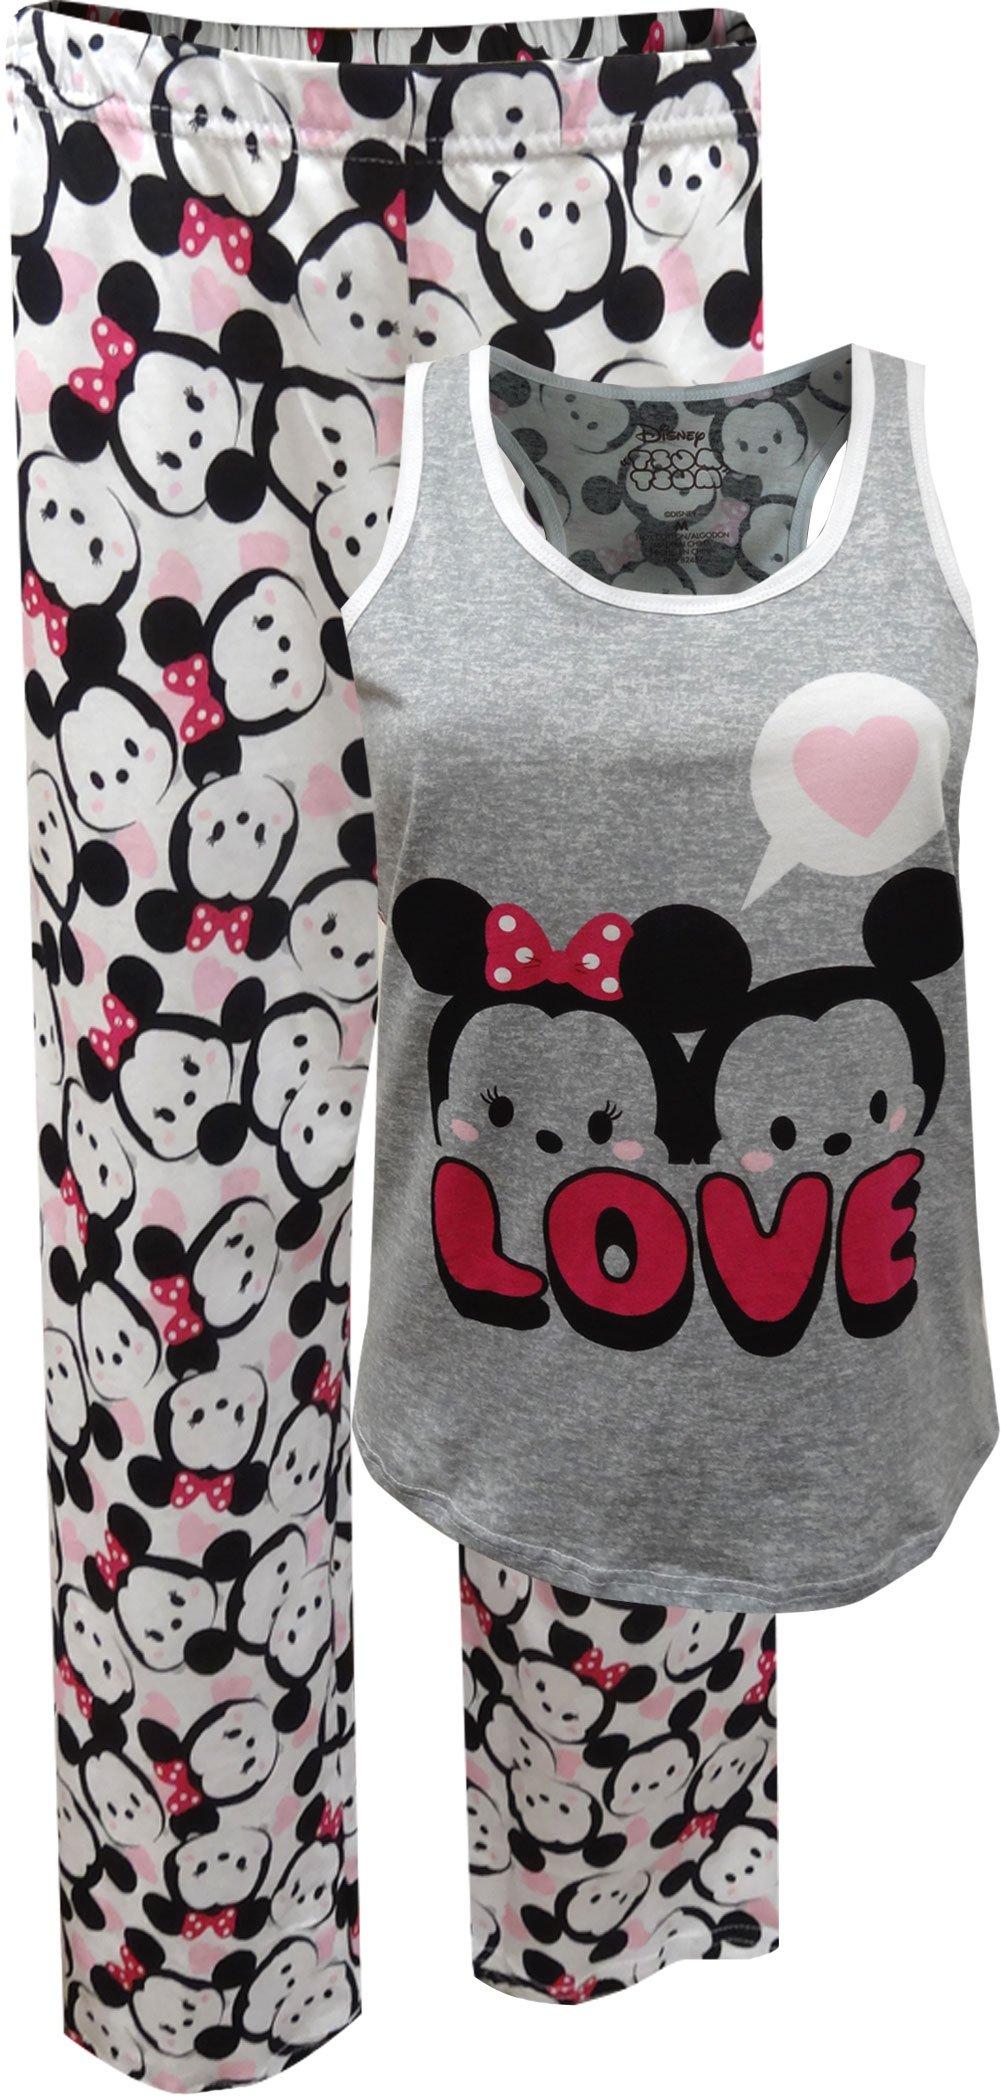 Disney Women's Tsum Tsum 2-Piece Cotton Jersey Pajama Set, Gray, XL